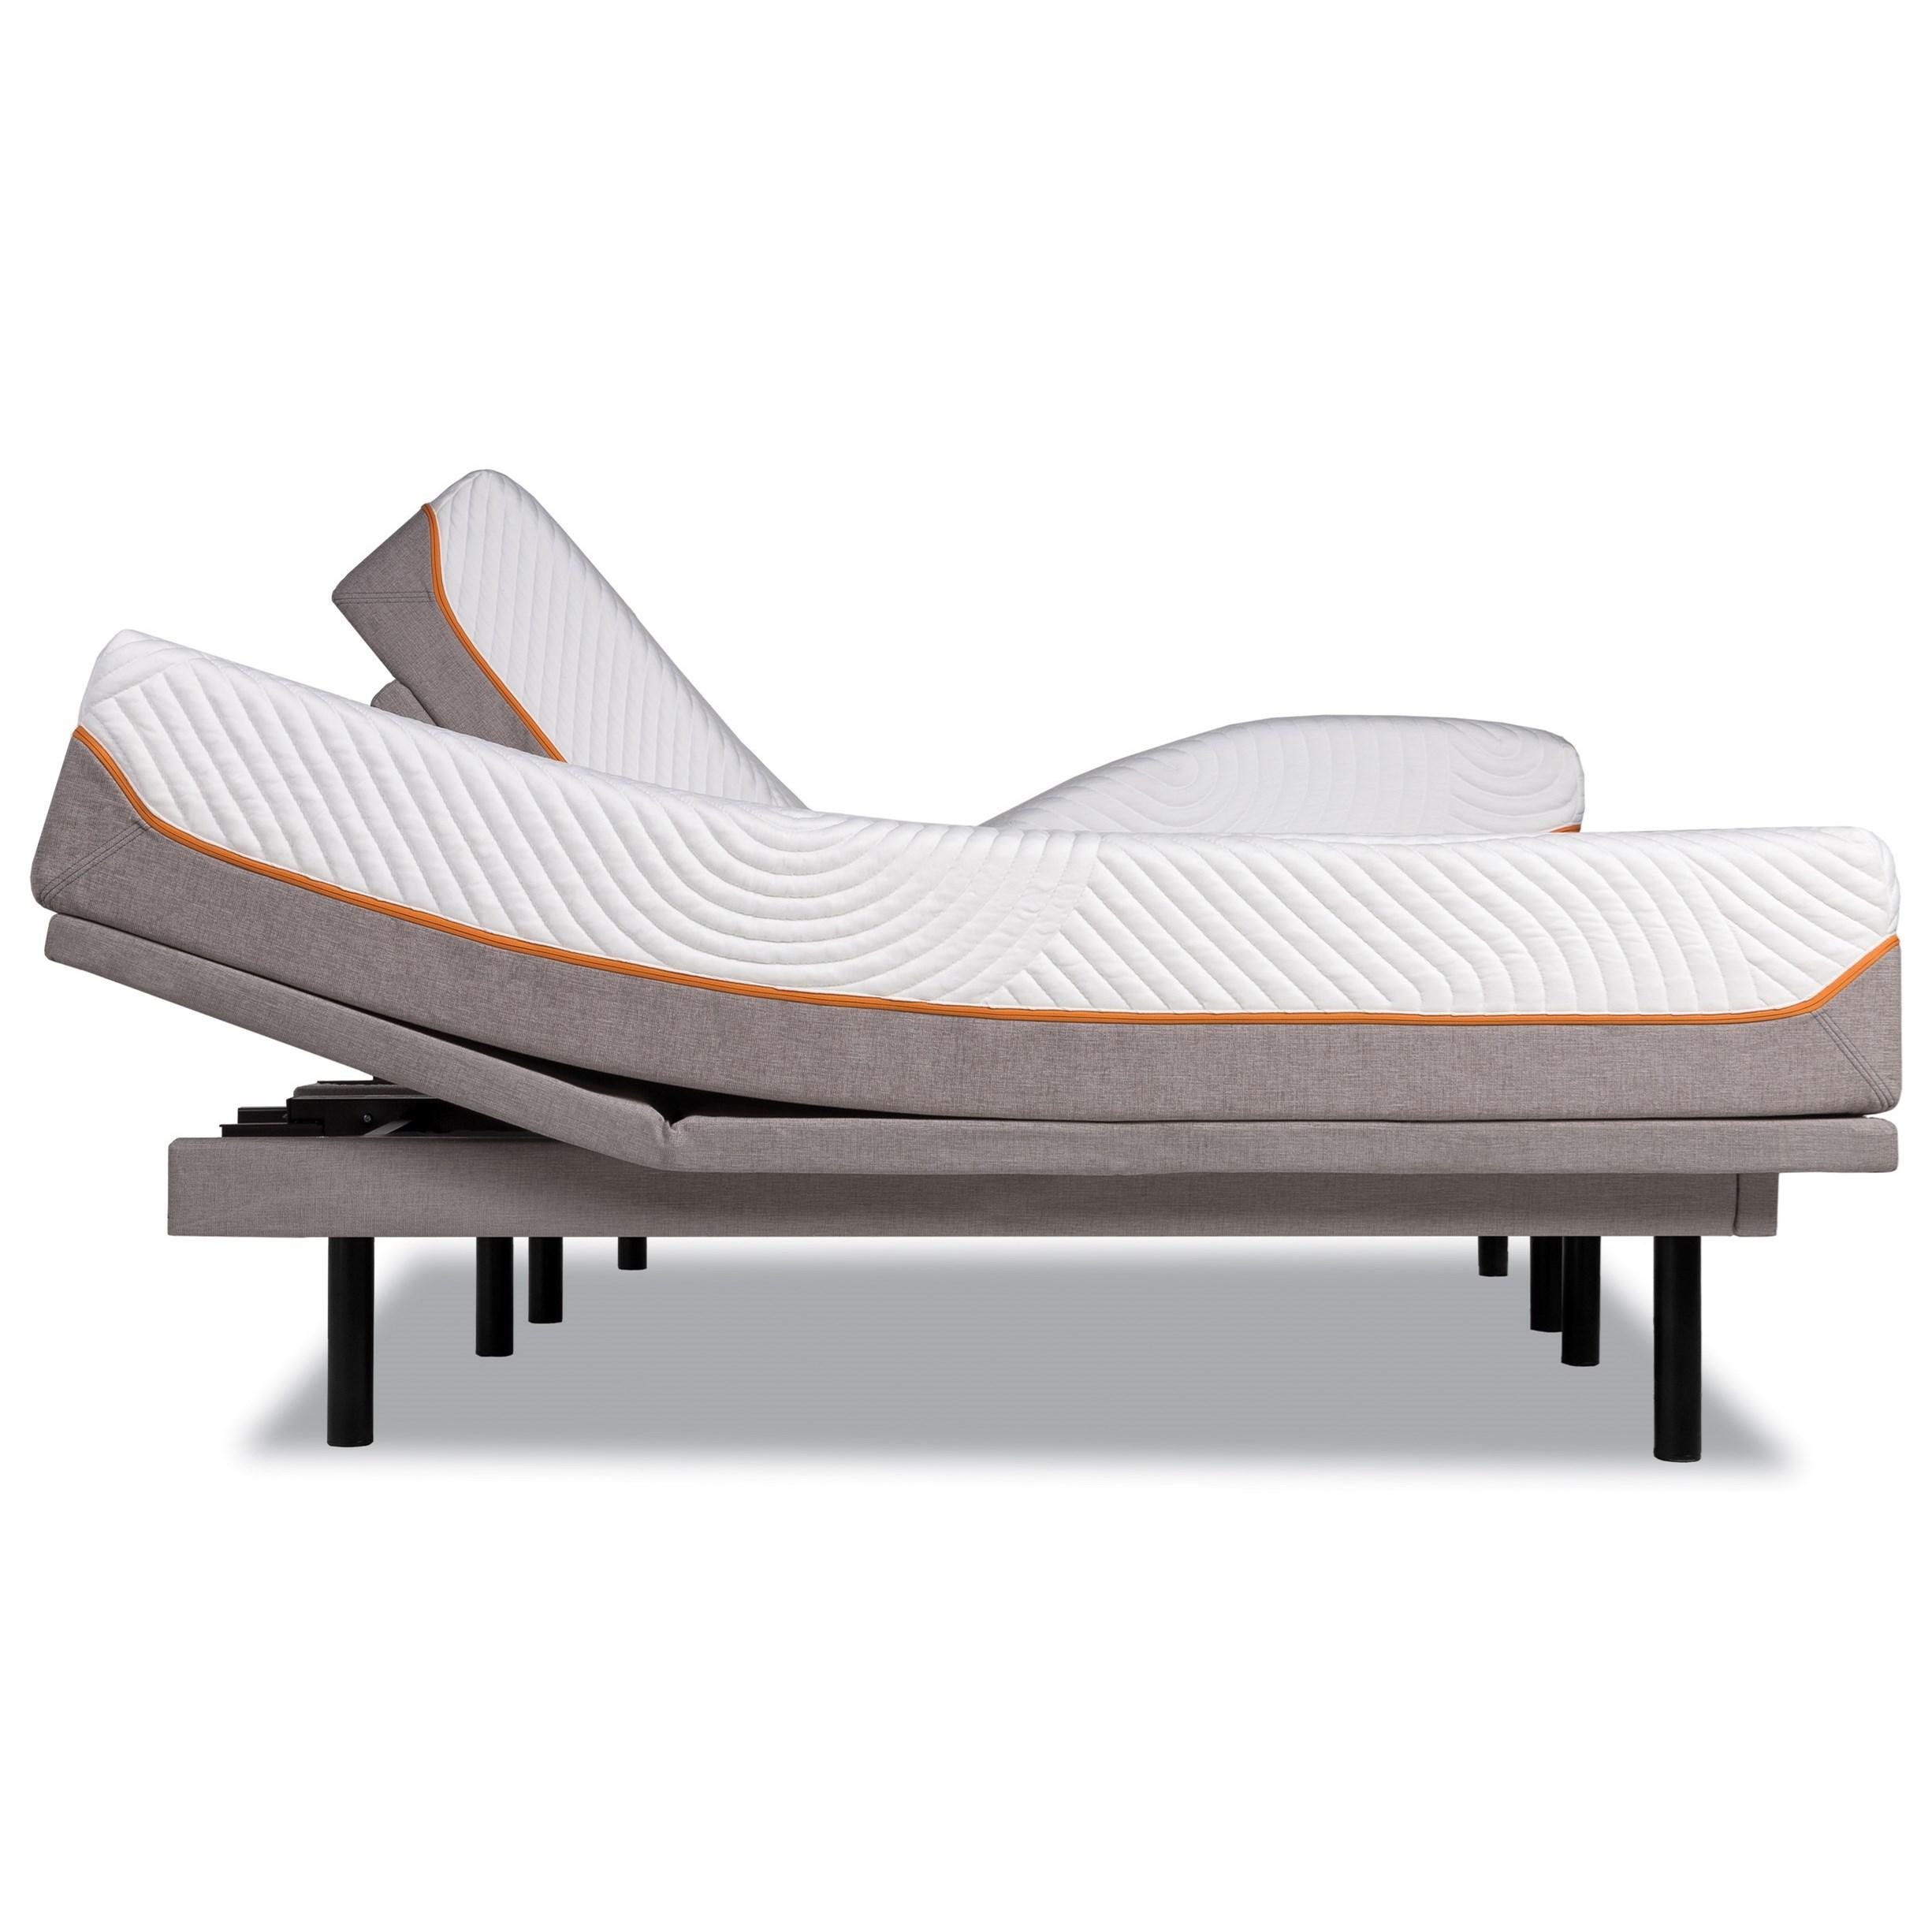 Tempur-Pedic® TEMPUR-Contour Supreme Twin Firm Mattress Set - Item Number: 10256110+25289210